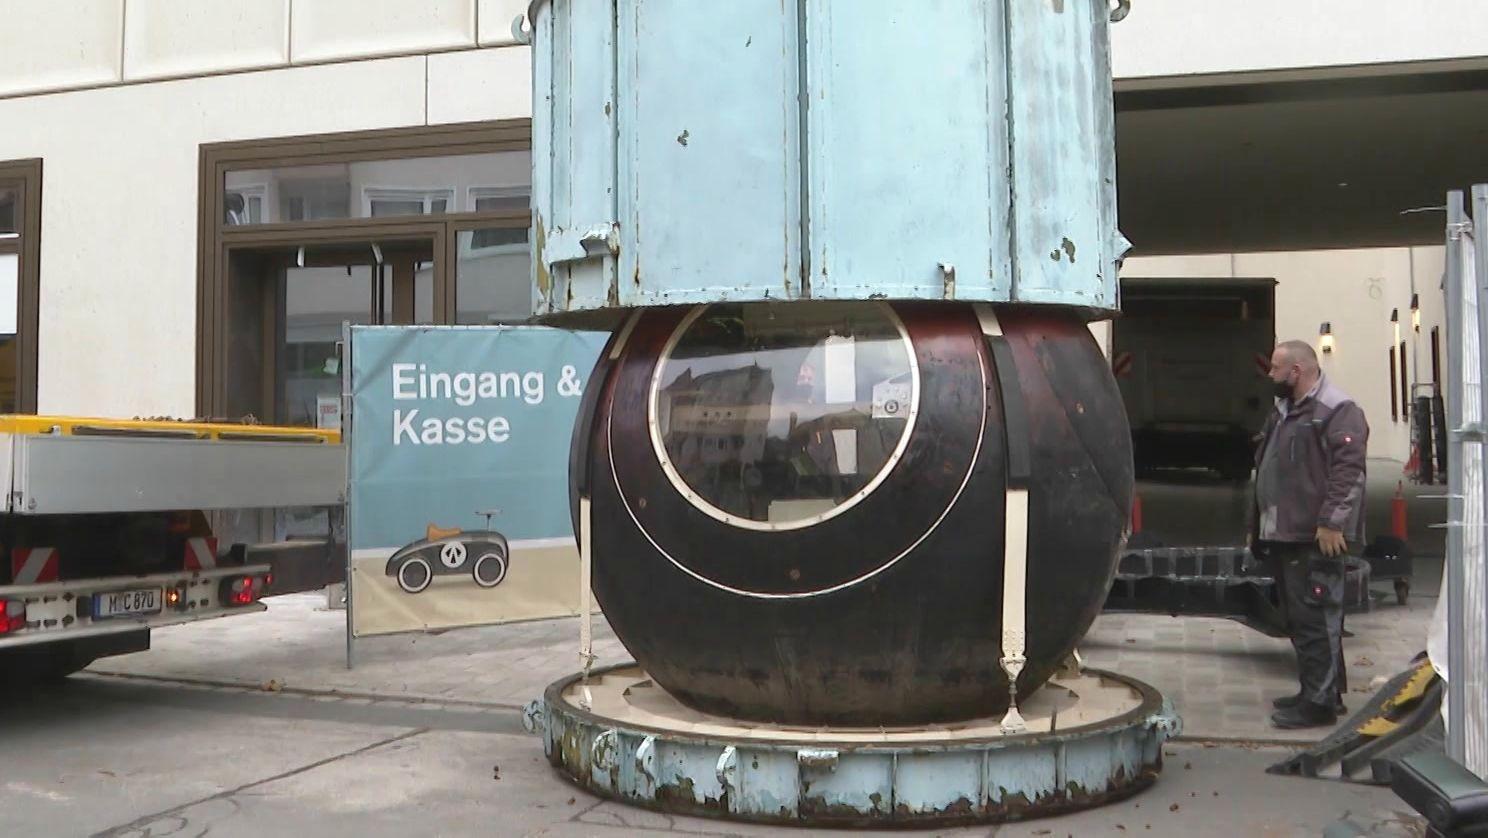 Die Foton-Raumkapsel wird vor dem Museum abgeladen